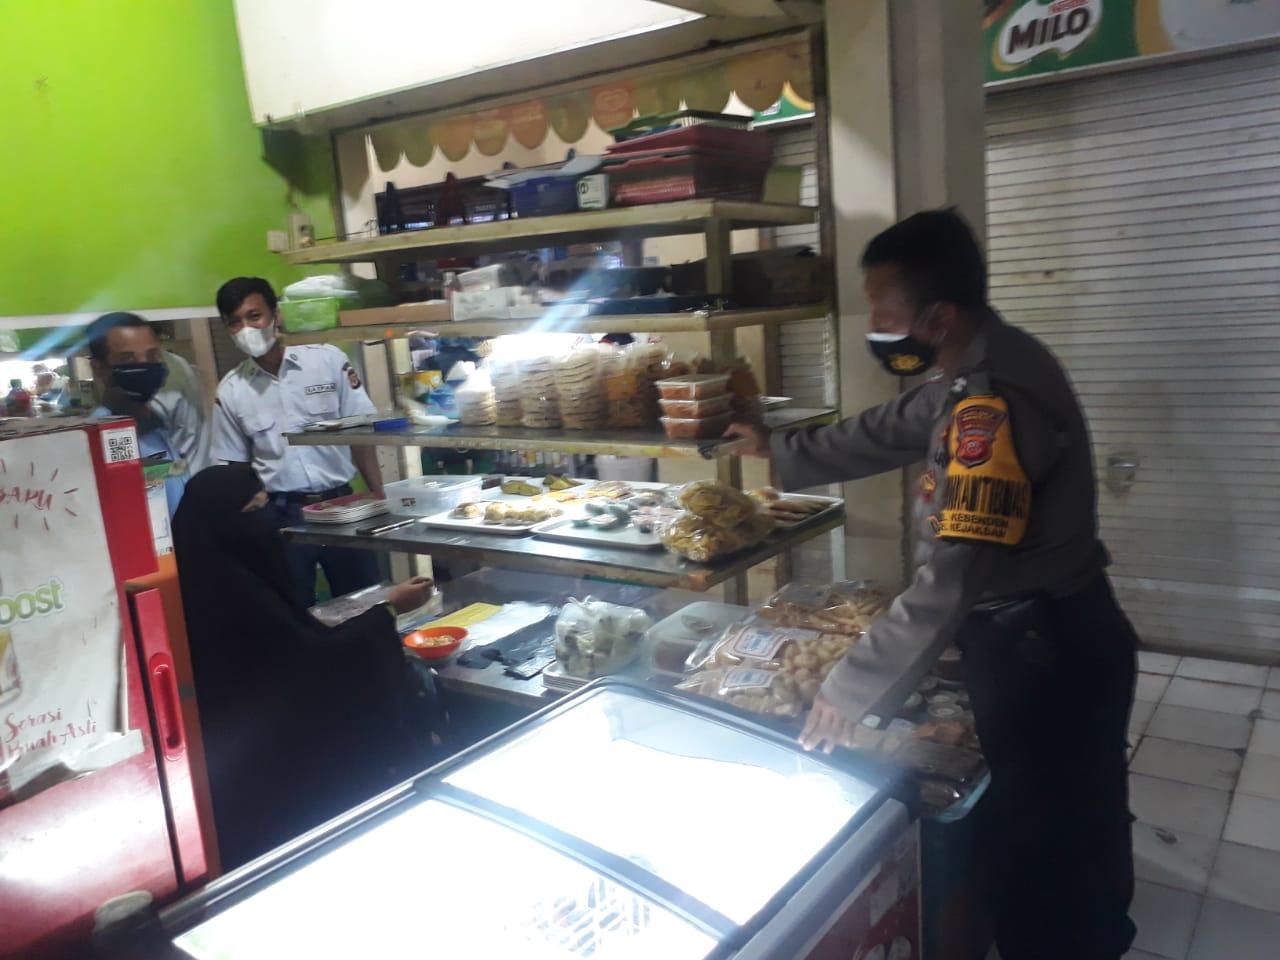 Bhabinkamtibmas Polsek Utbar Ciko, Gelar Posko PPKM Terpadu di Pasar Keramat